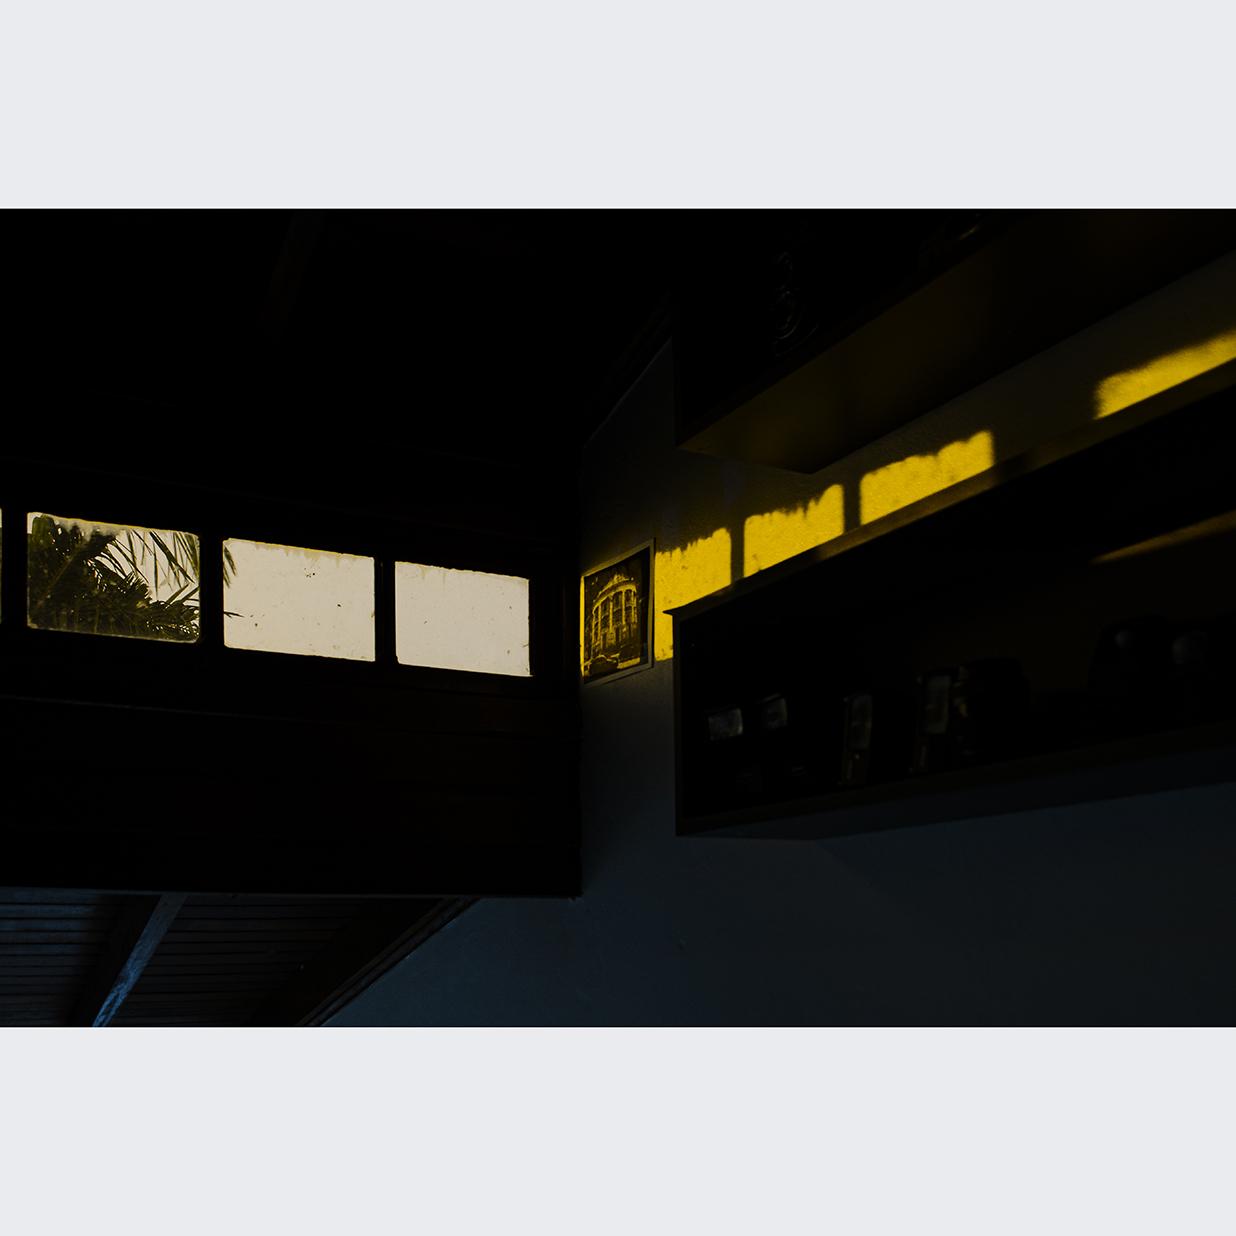 Ário Gonçalves - Título: Antiga faculdade de medicina UFRGS